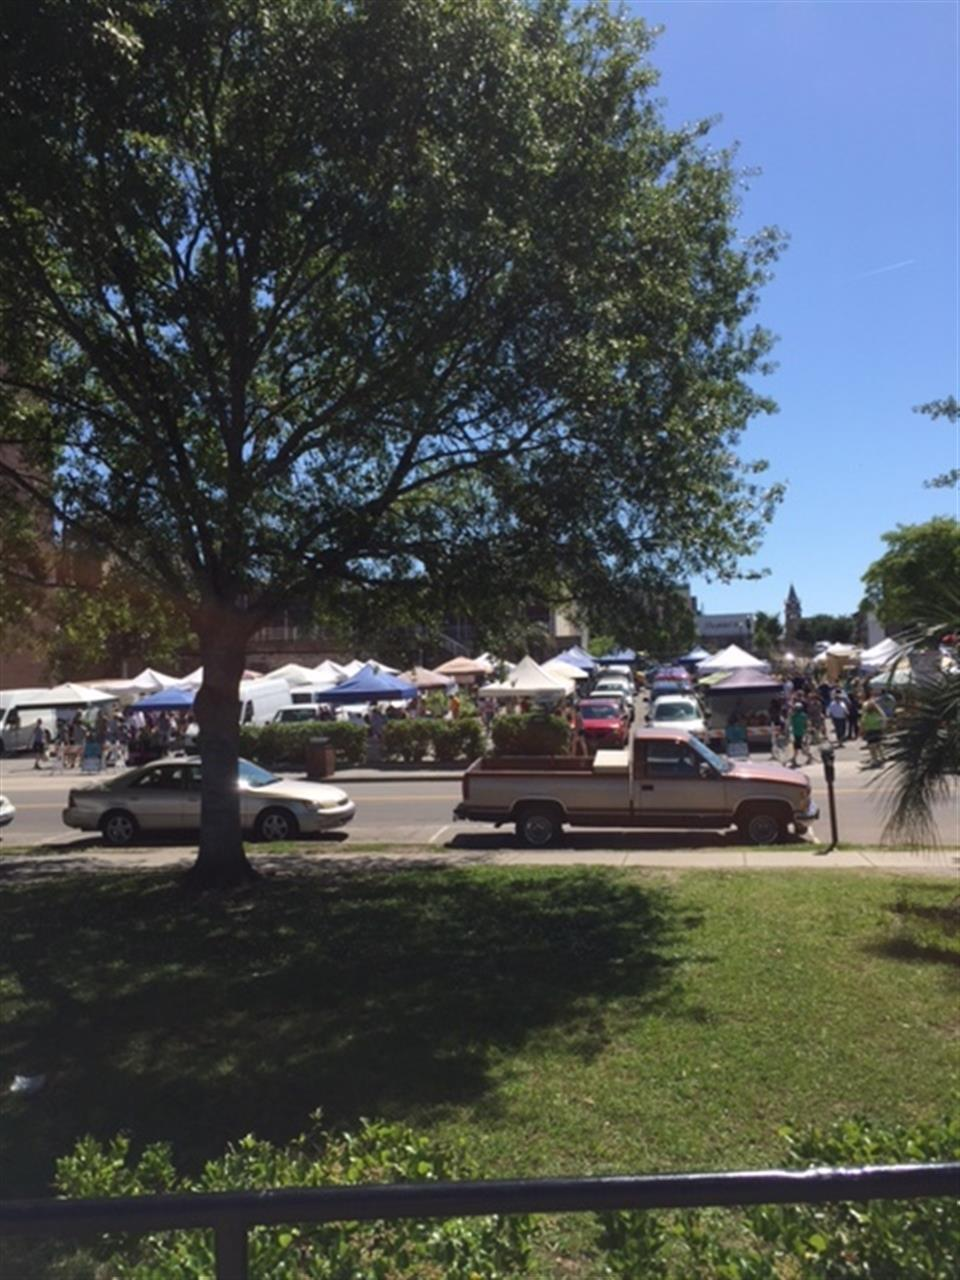 Wilmington NC  Riverwalk Farmers Market